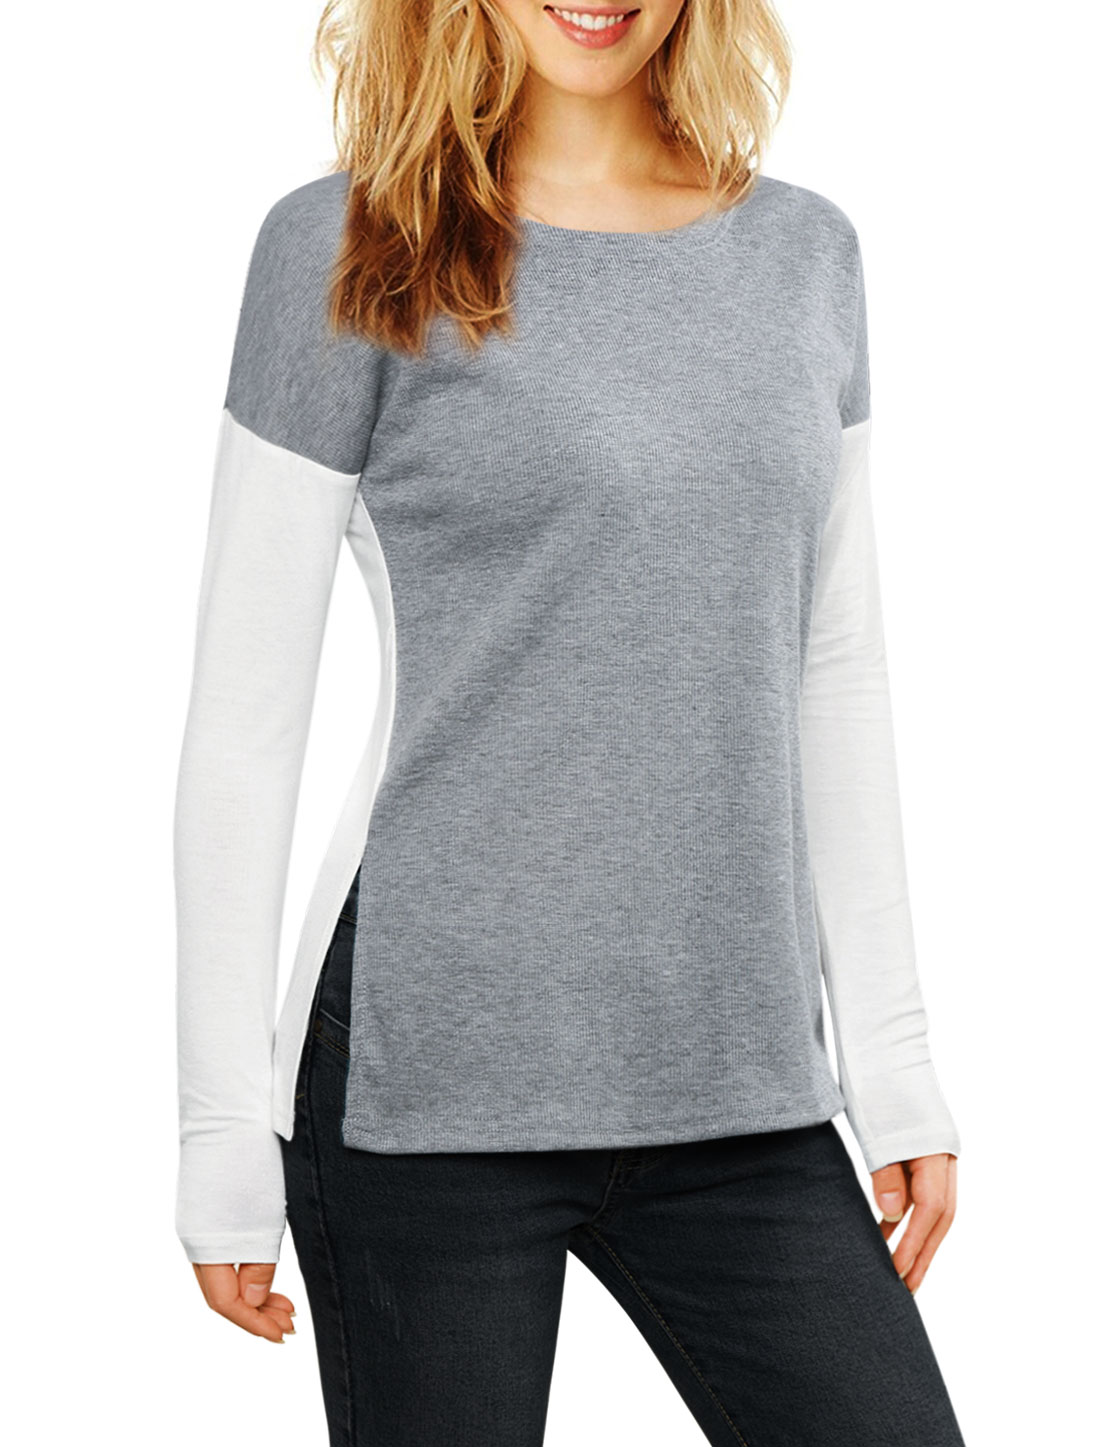 Women Color Block Side-Slit Paneled Slim Fit Ribbed Top Gray S